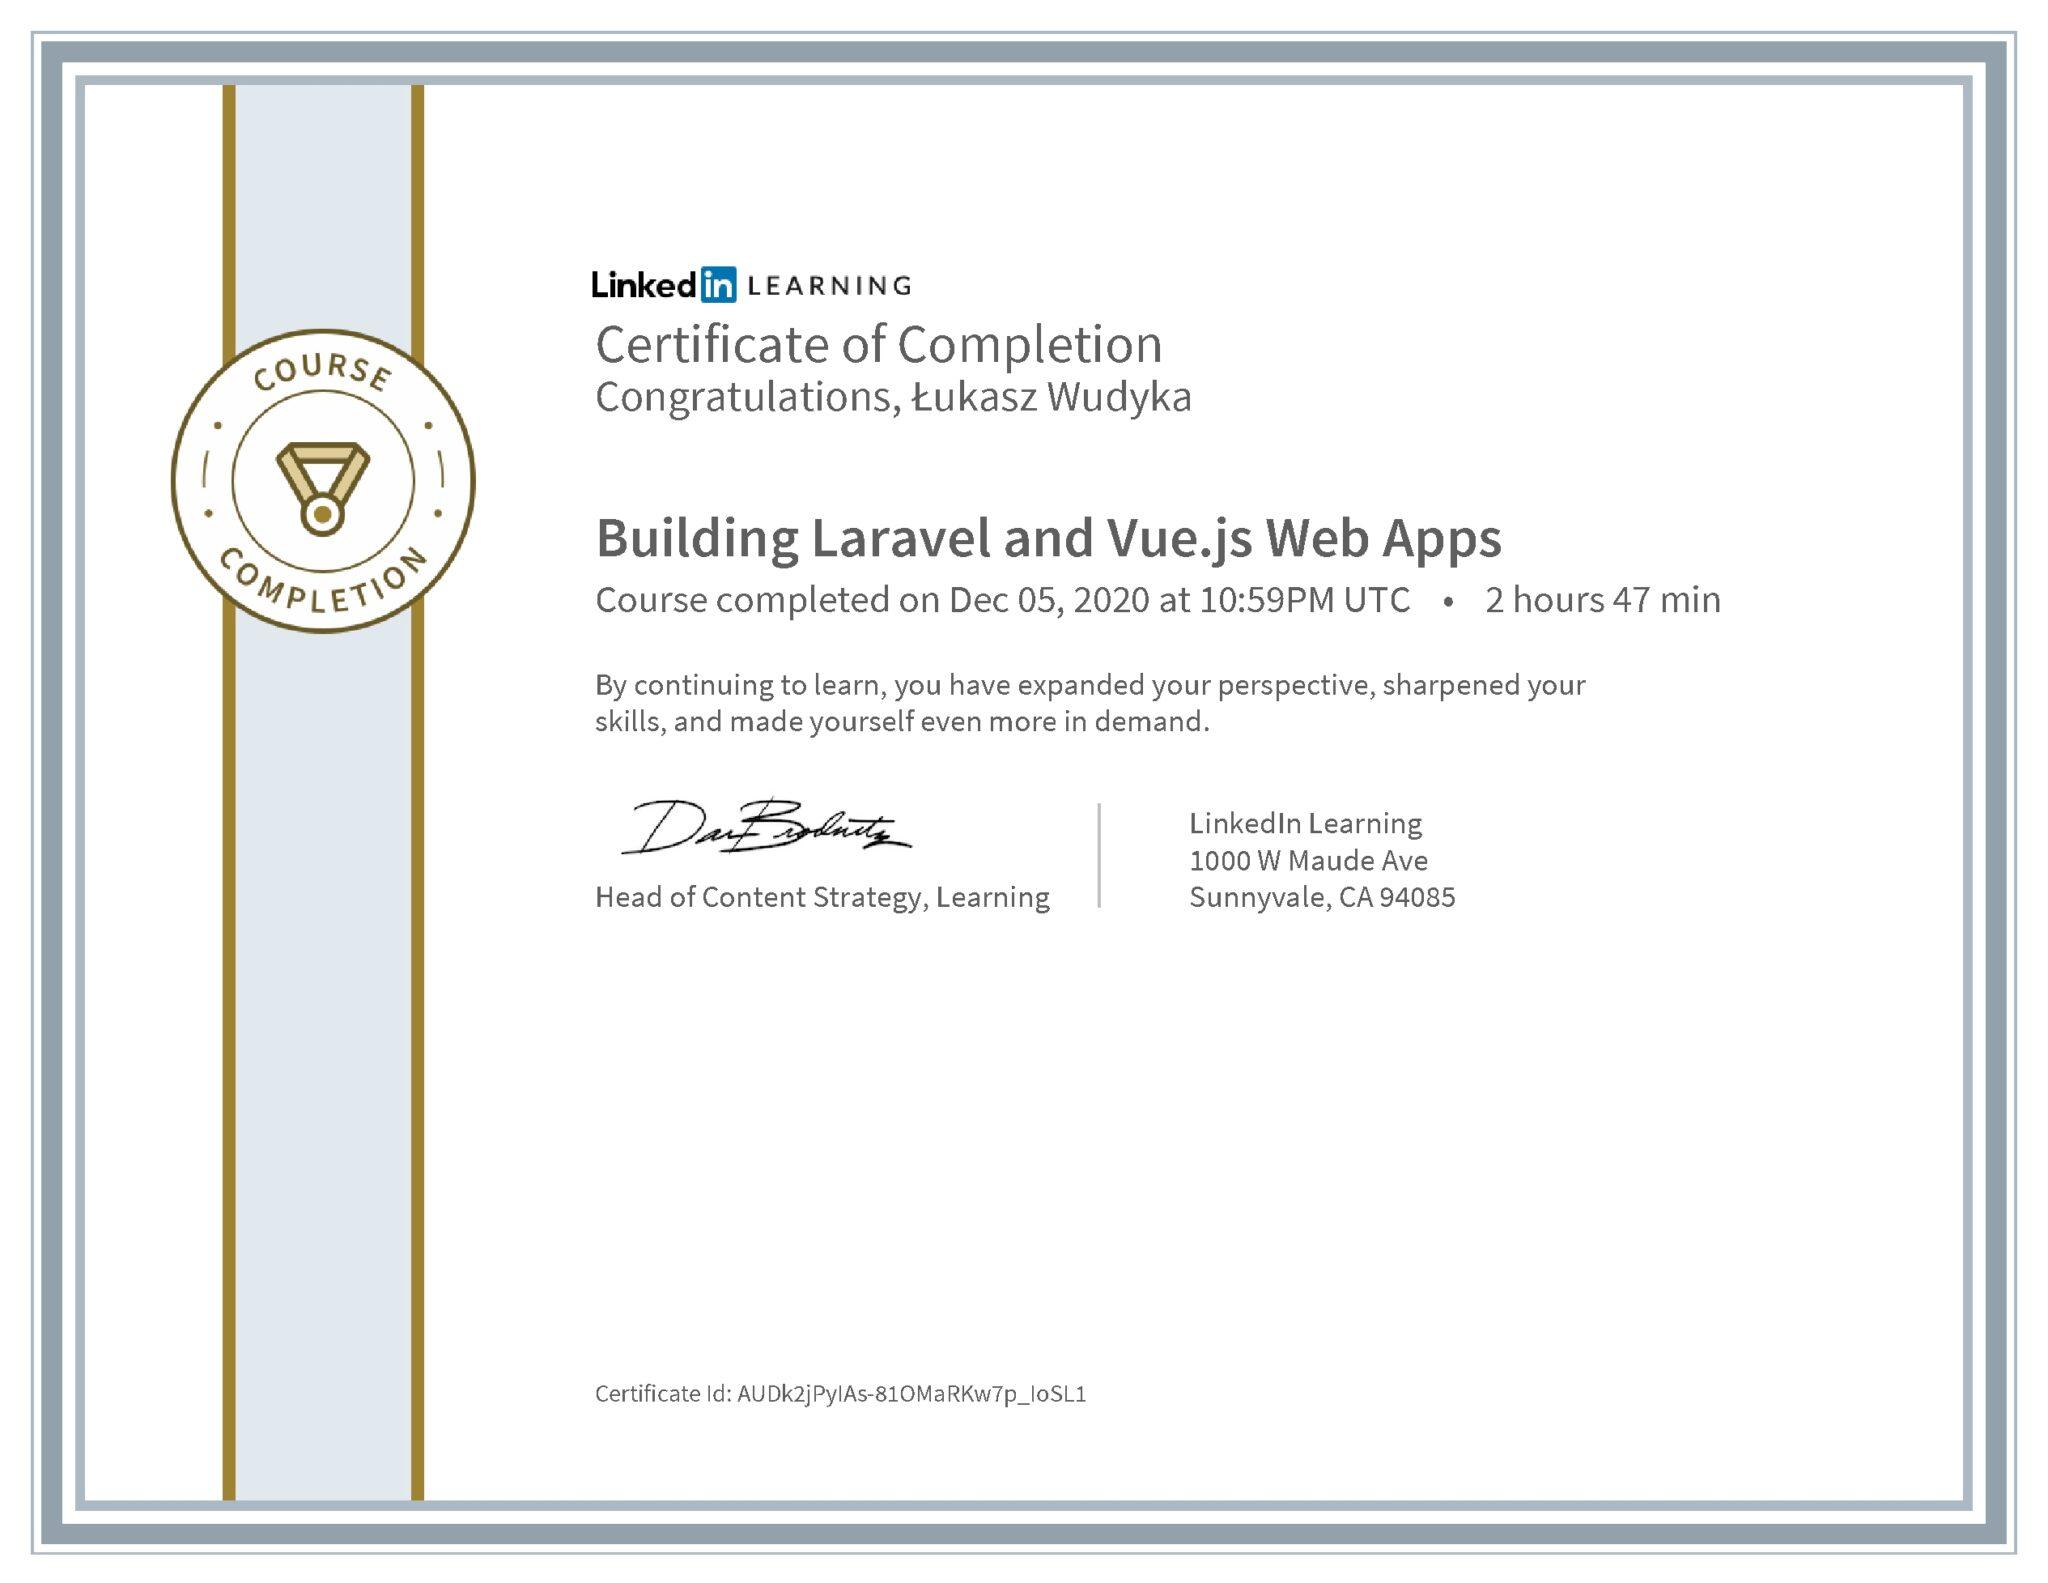 Łukasz Wudyka certyfikat LinkedIn Building Laravel and Vue.js Web Apps